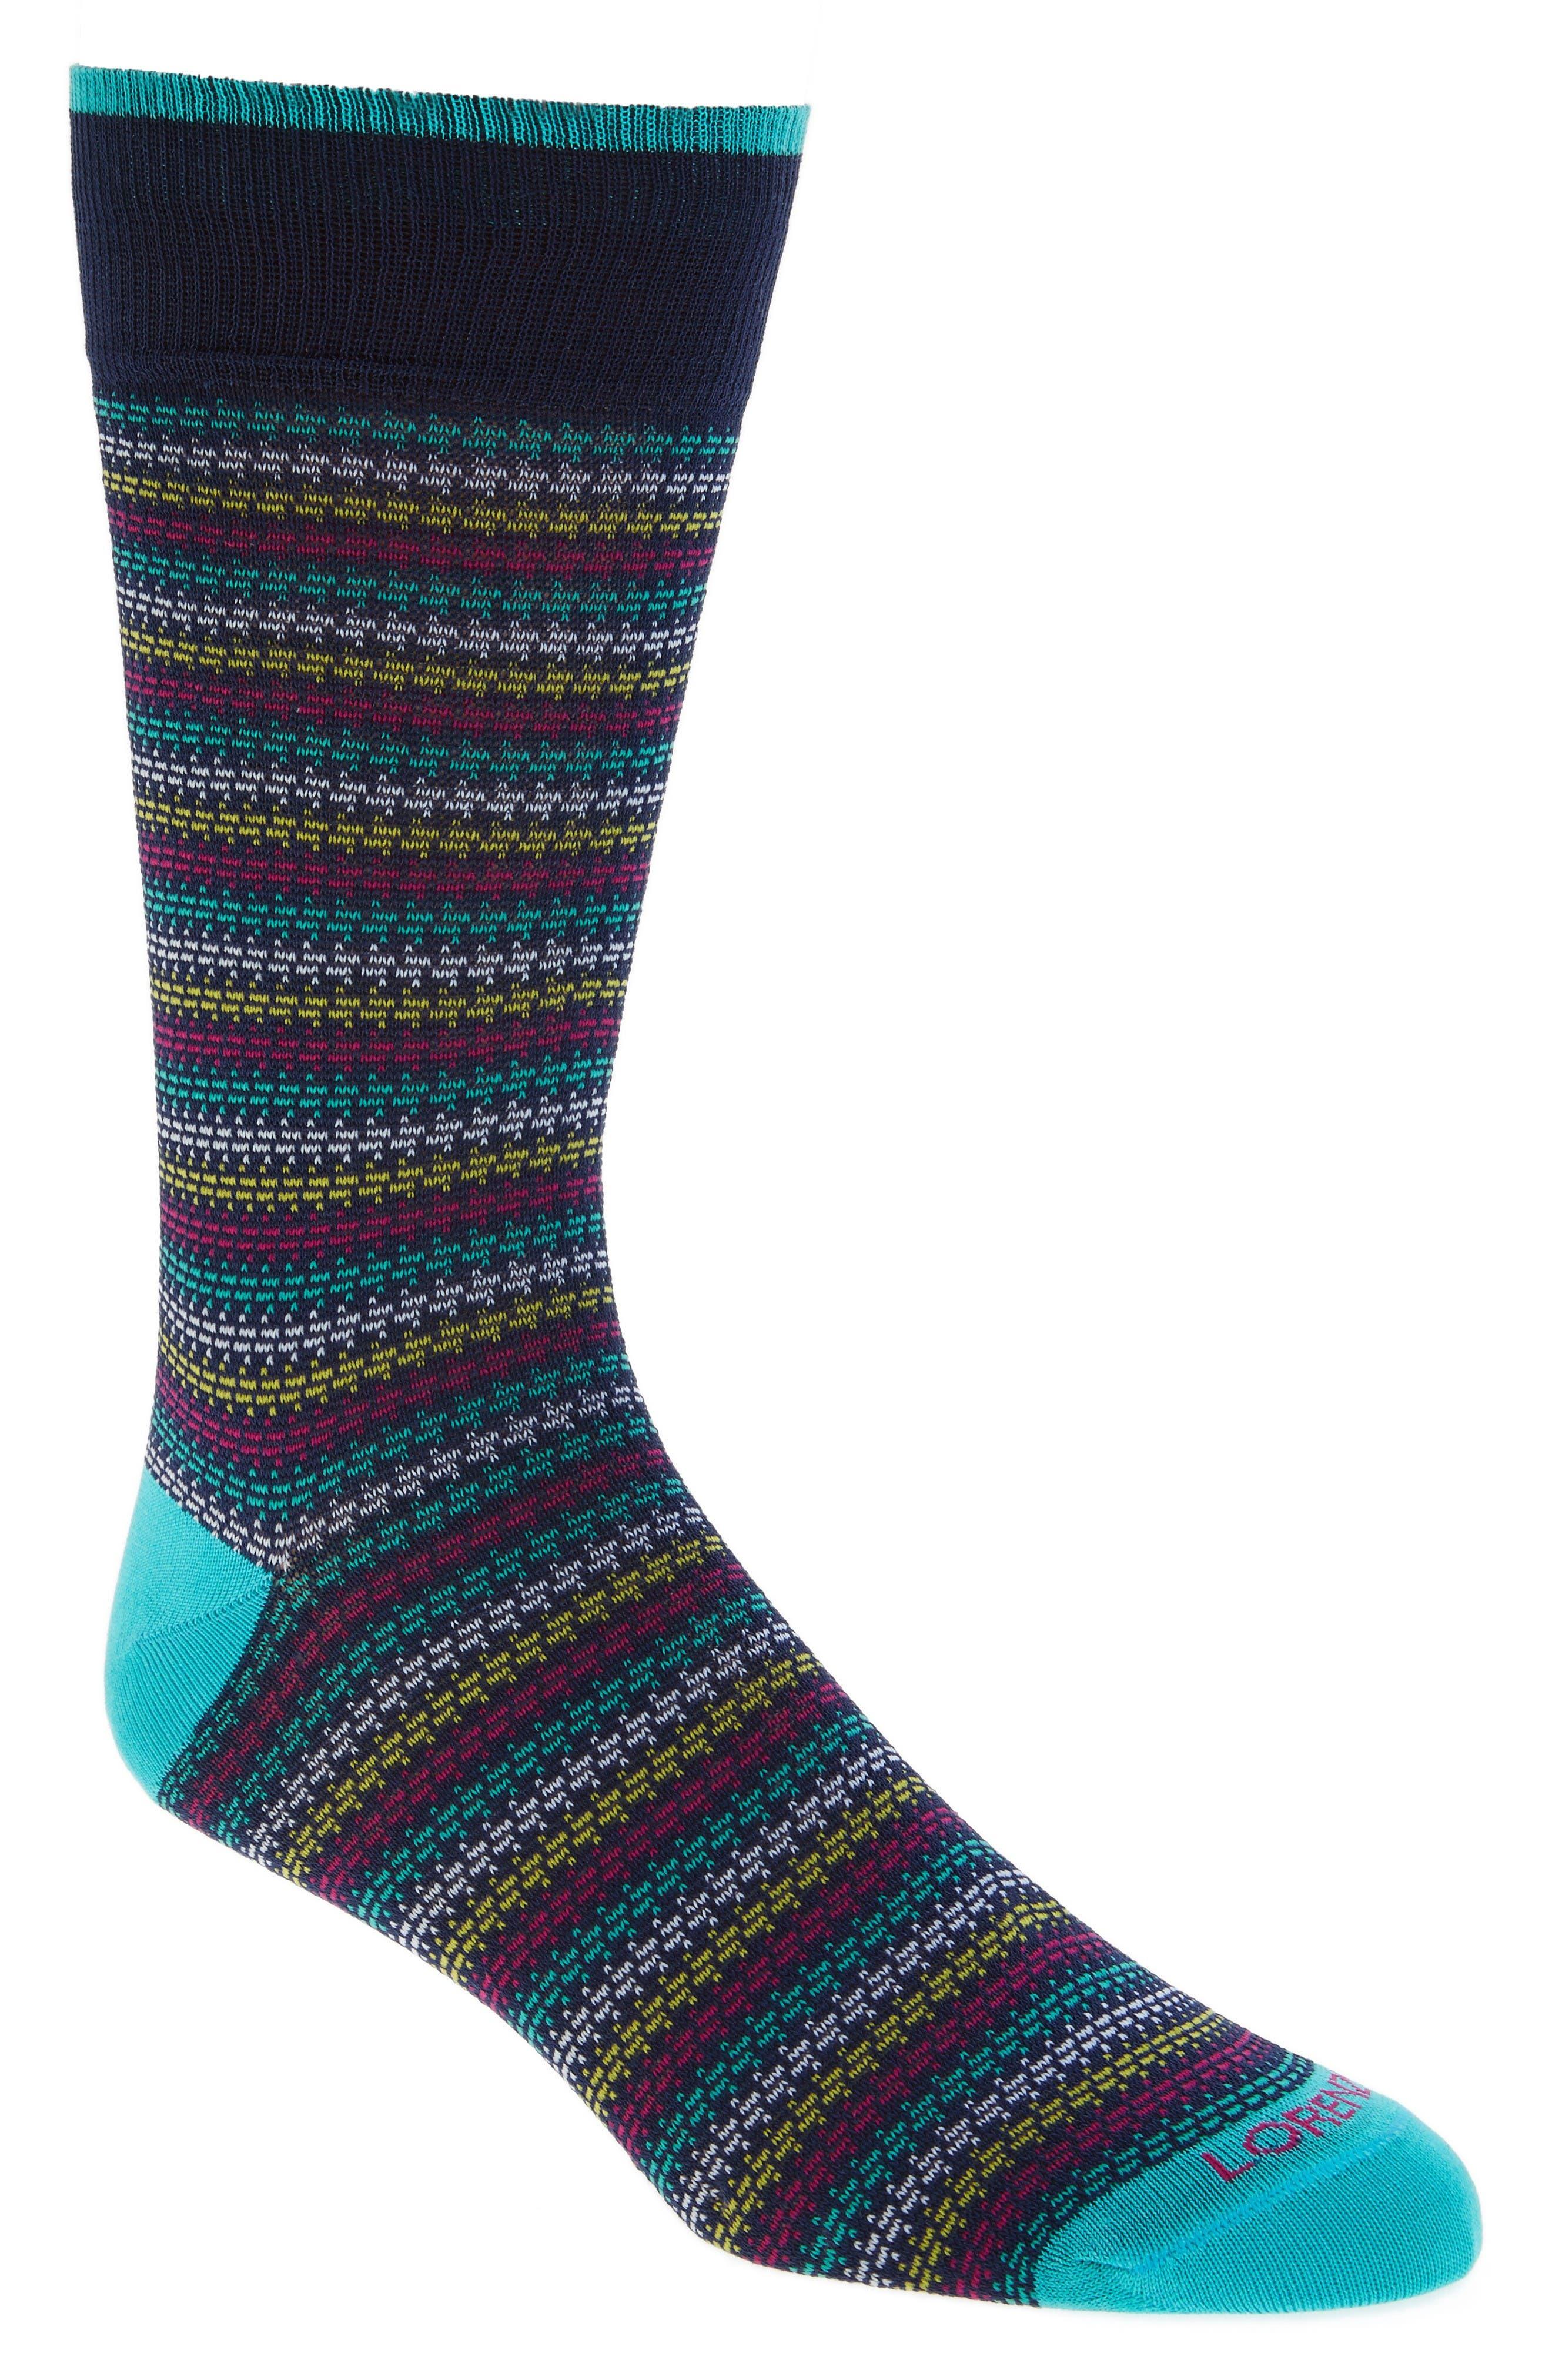 Houndstooth Stripe Crew Socks,                         Main,                         color, Navy/ Teal